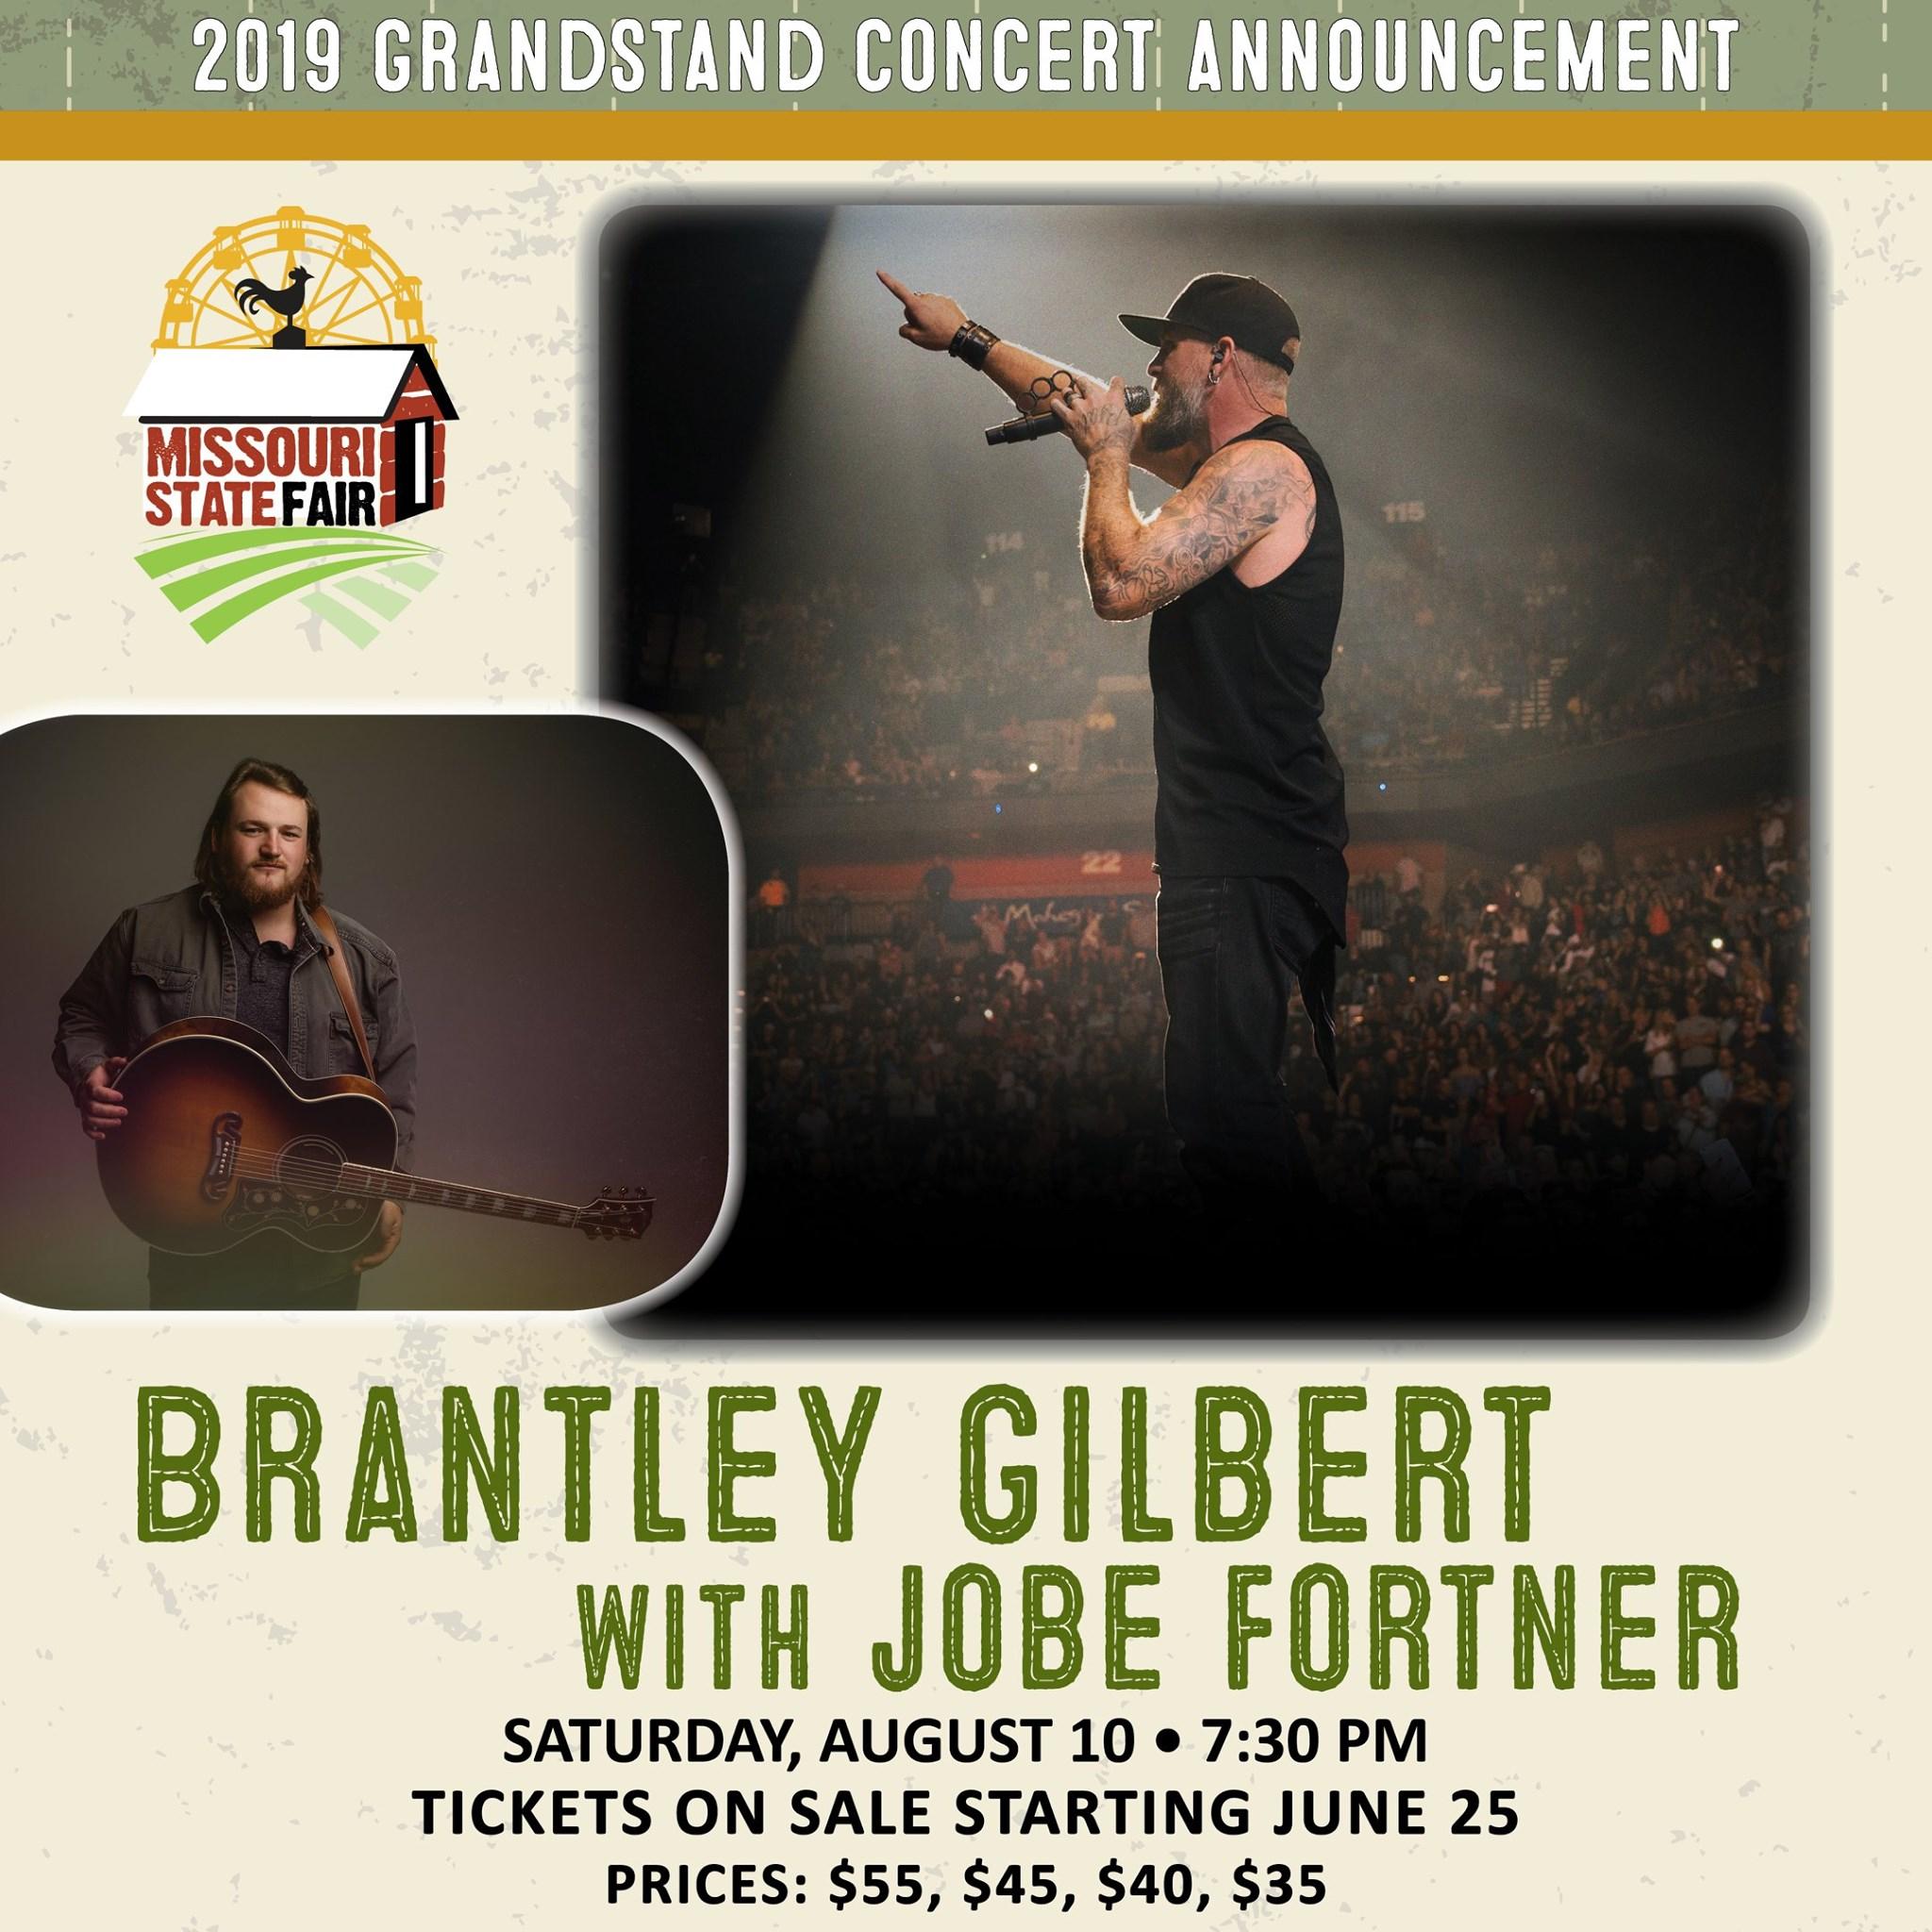 Missouri State Fair announces last three concerts: Brantley Gilbert, Dwight Yoakam, The Struts